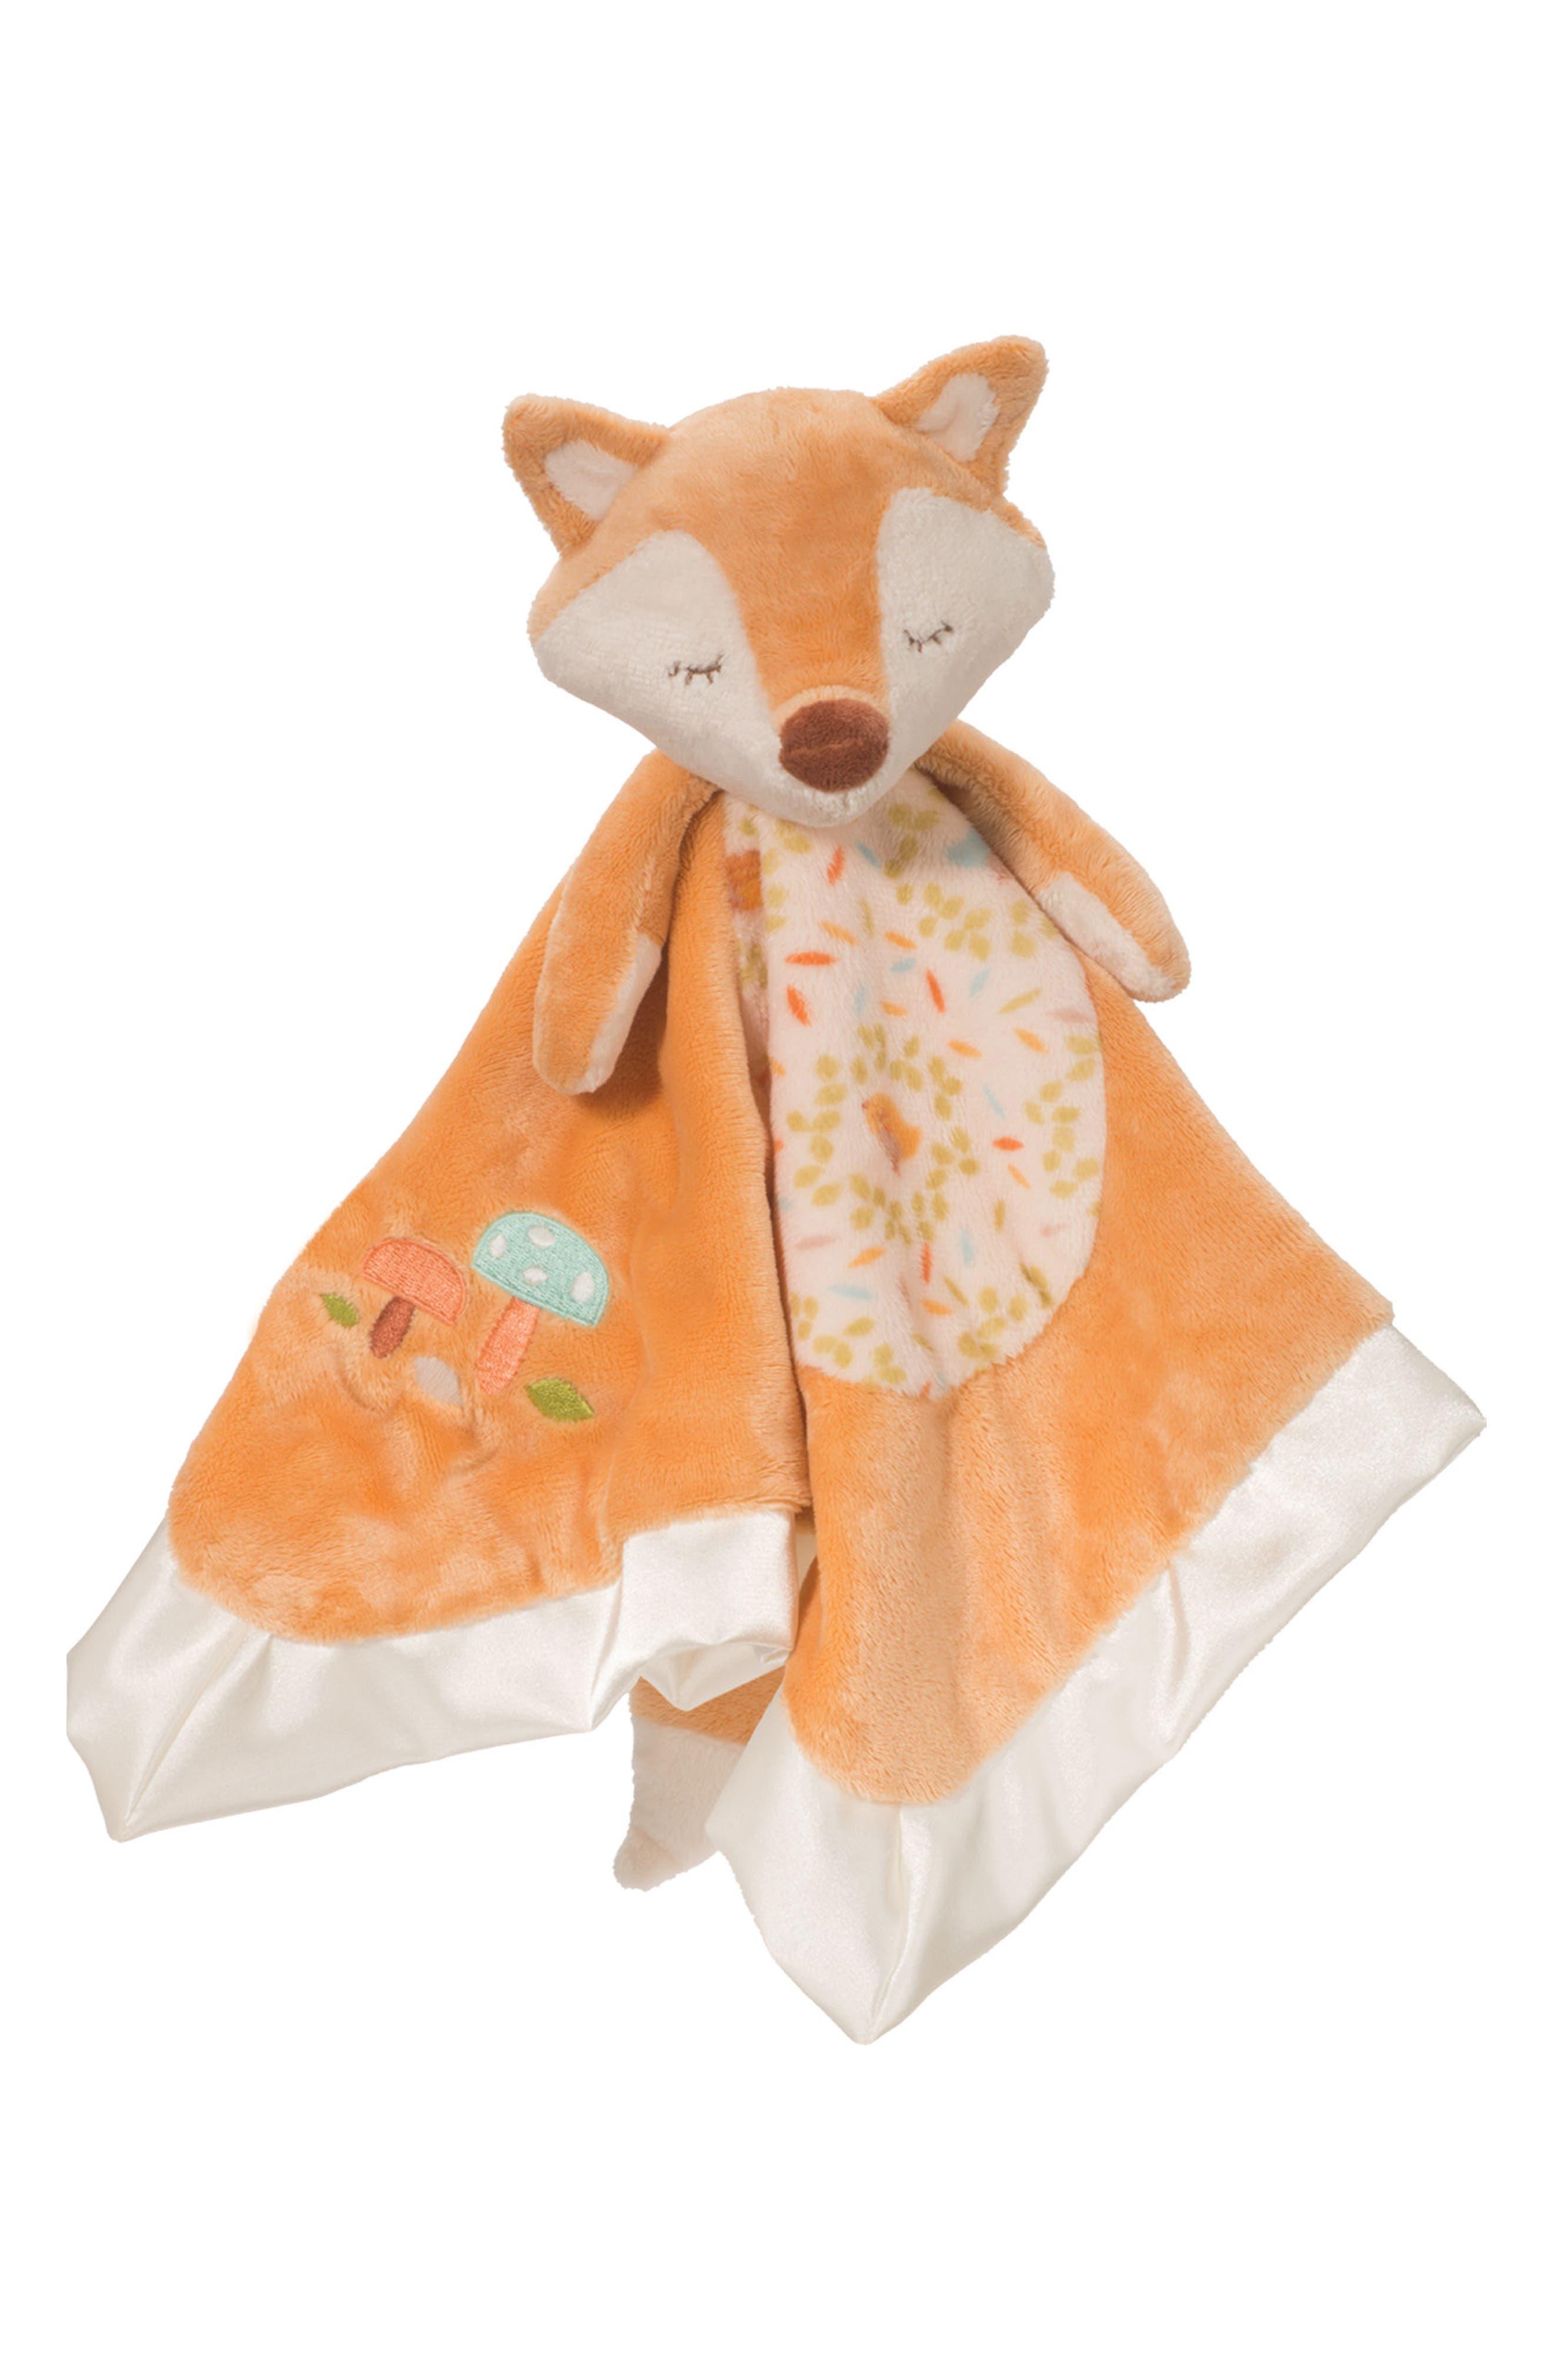 Douglas Fox Stuffed Animal Soother